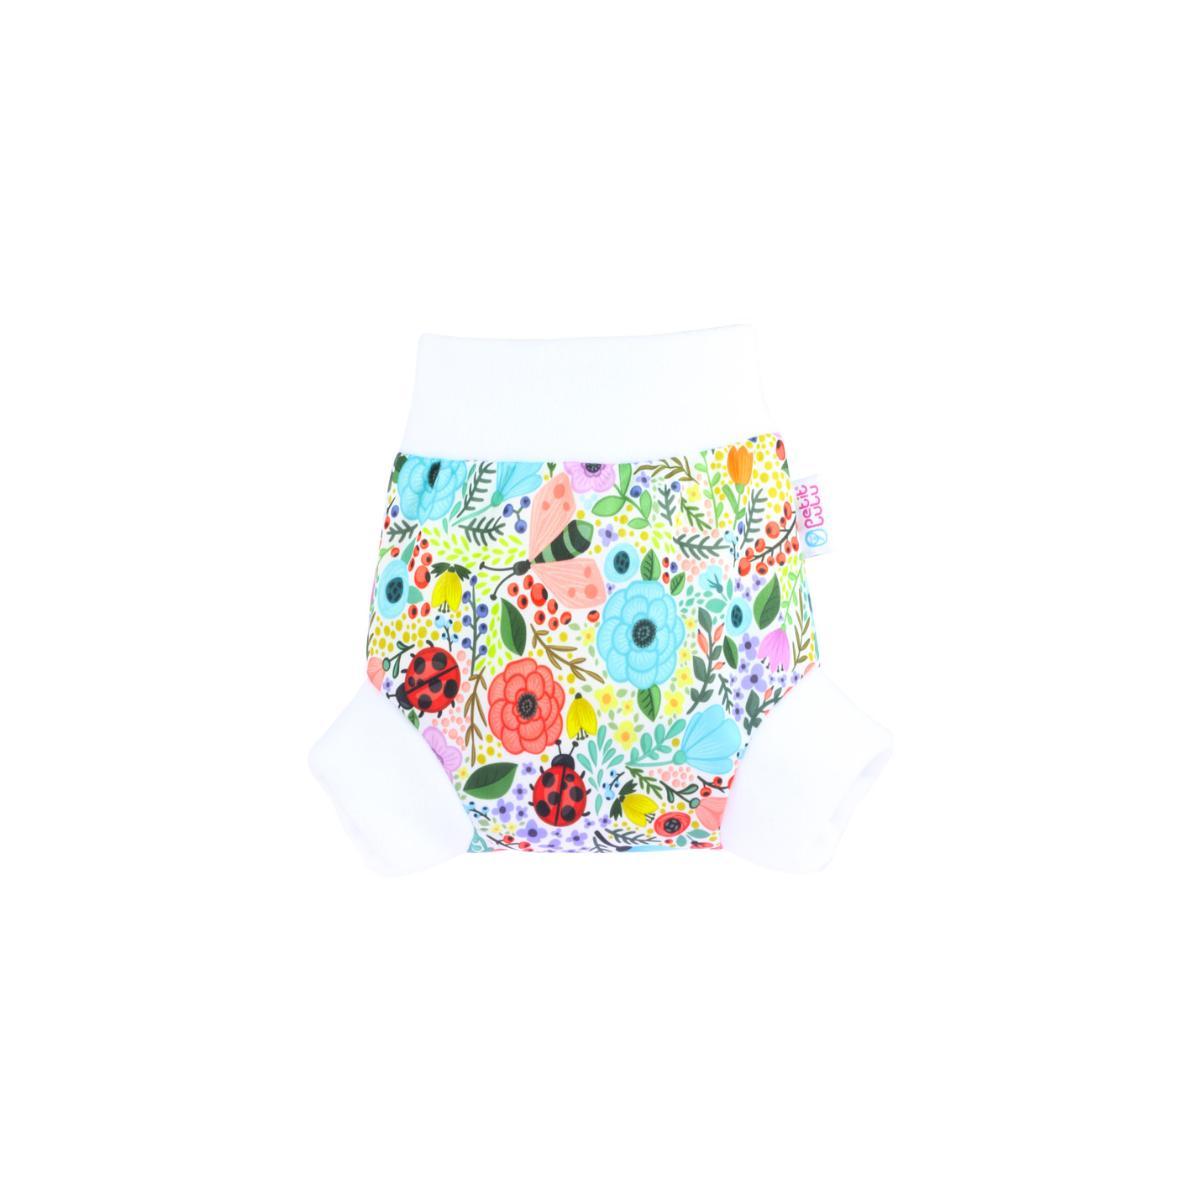 Petit Lulu Pull-up svrchní kalhotky, vel. XL 1 ks, Rozkvetlá zahrada